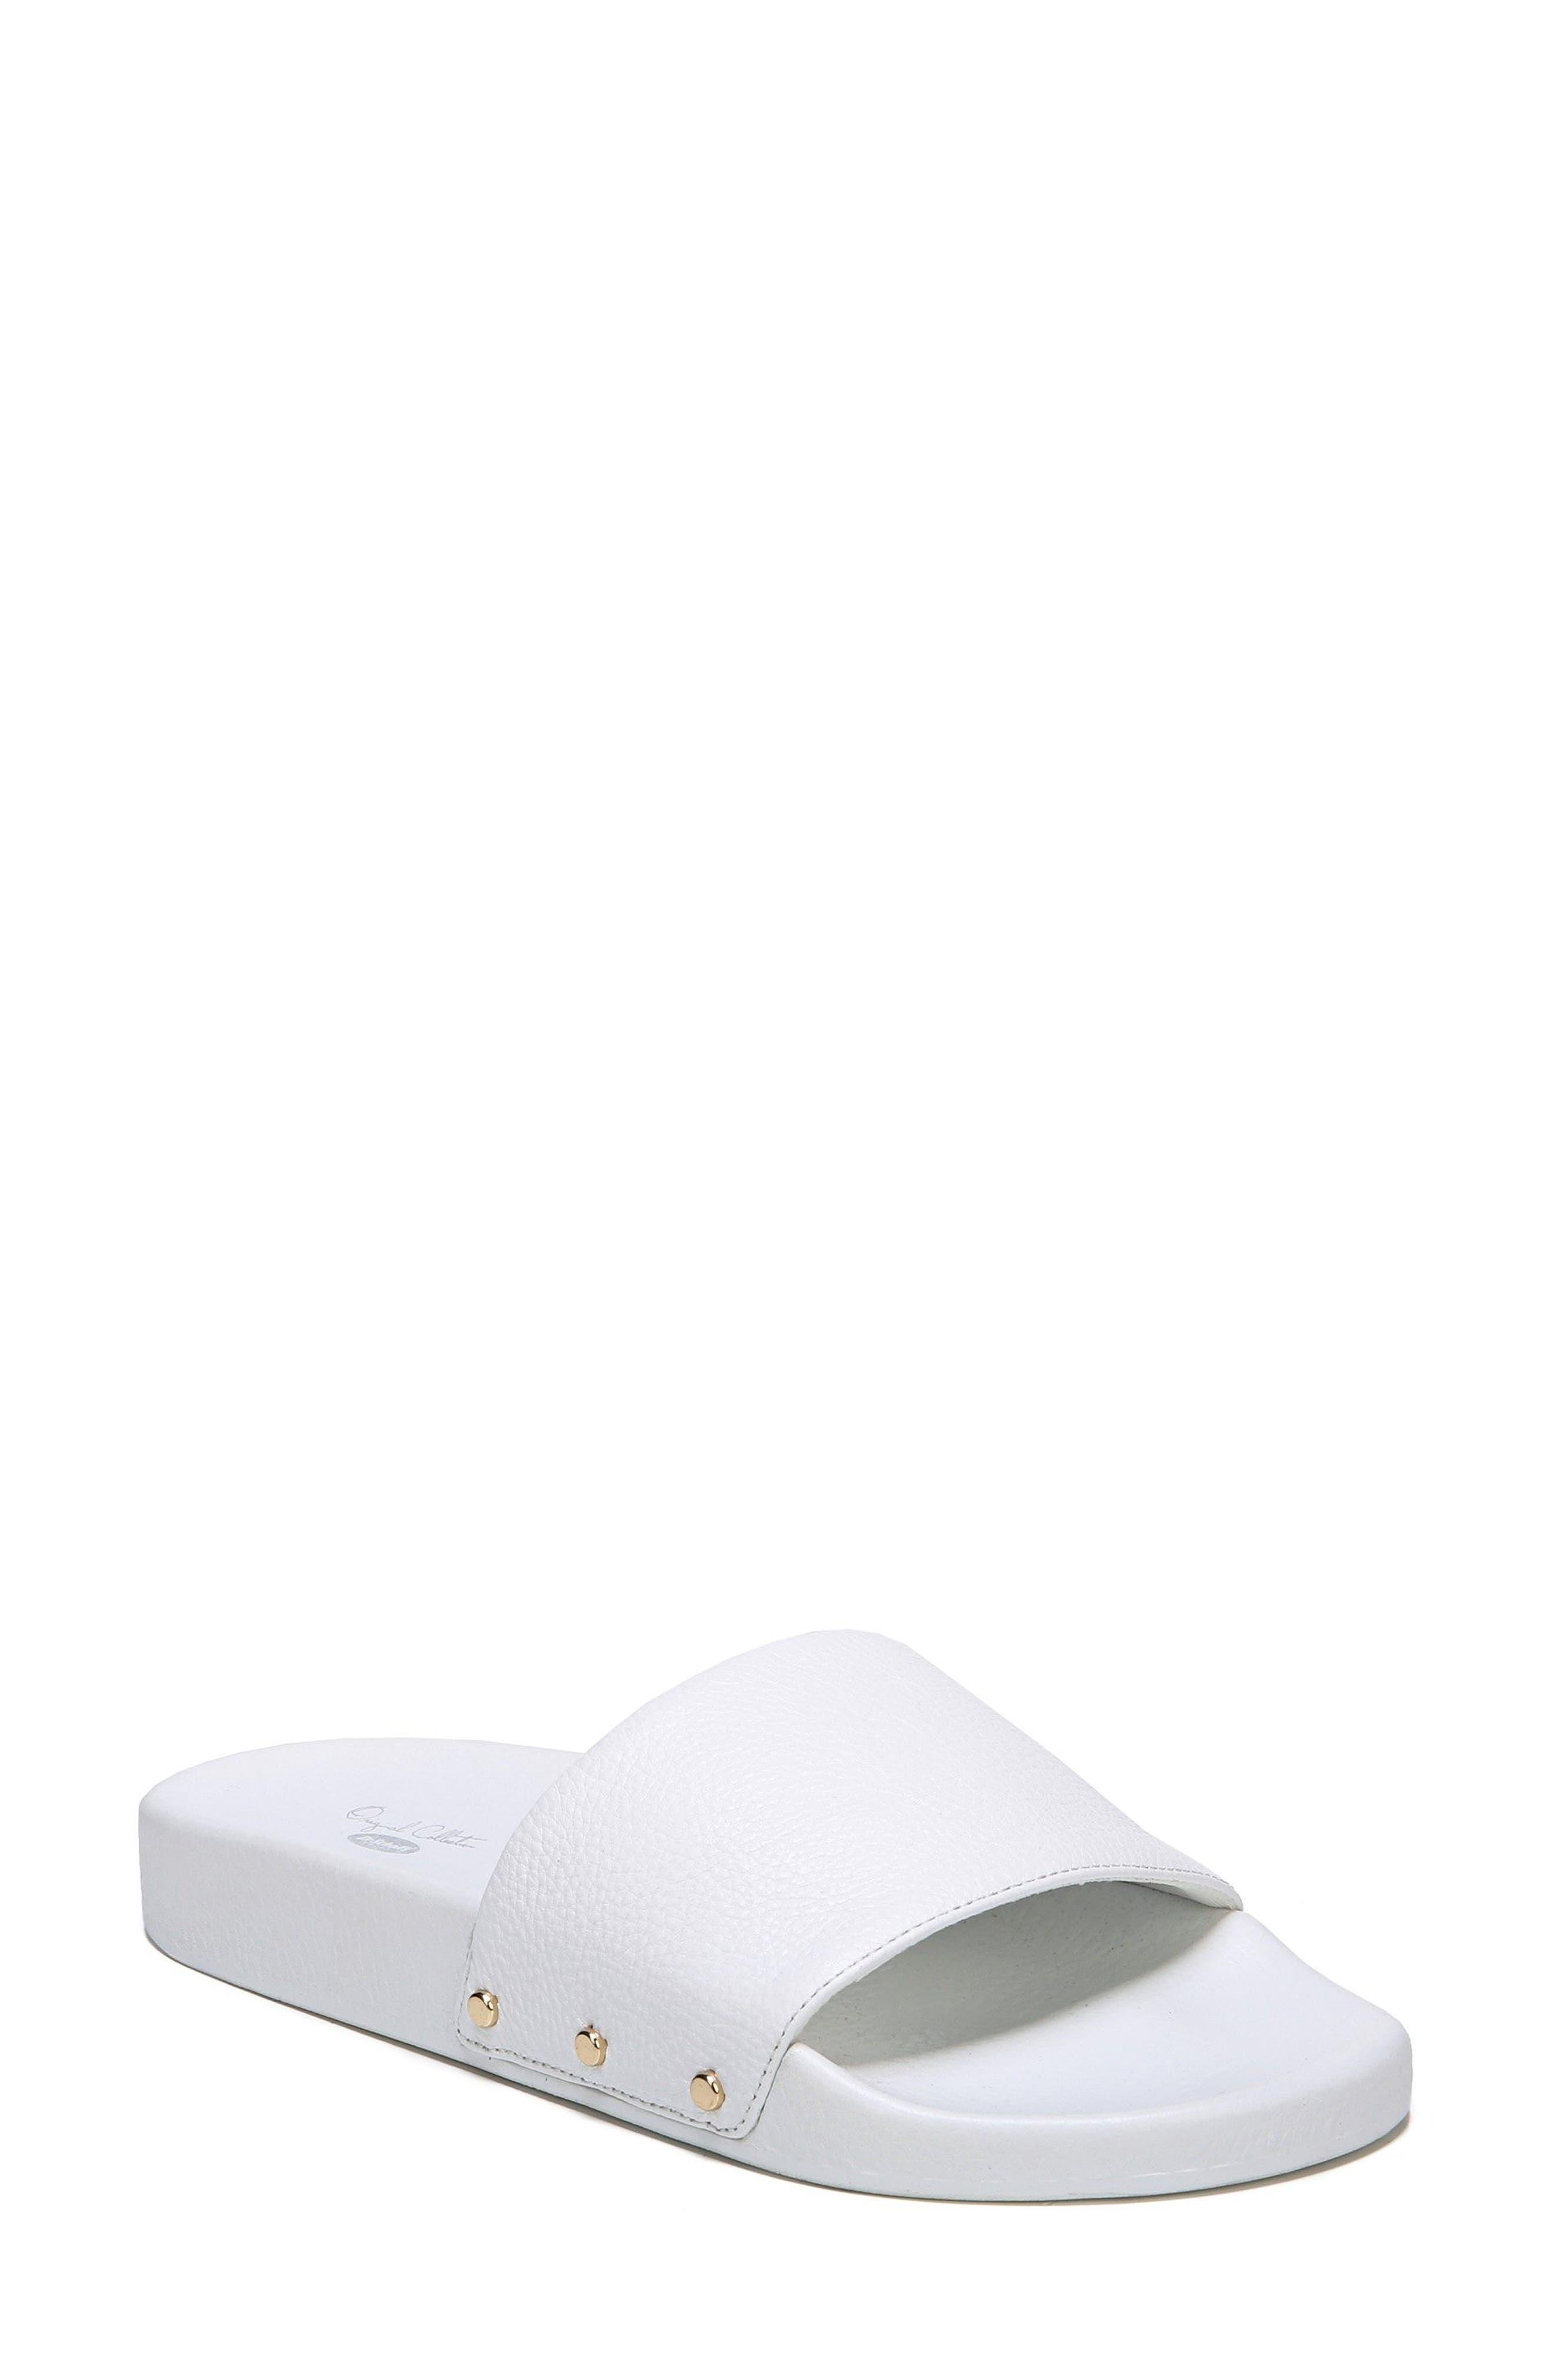 Pisces Slide Sandal,                             Main thumbnail 1, color,                             White Leather